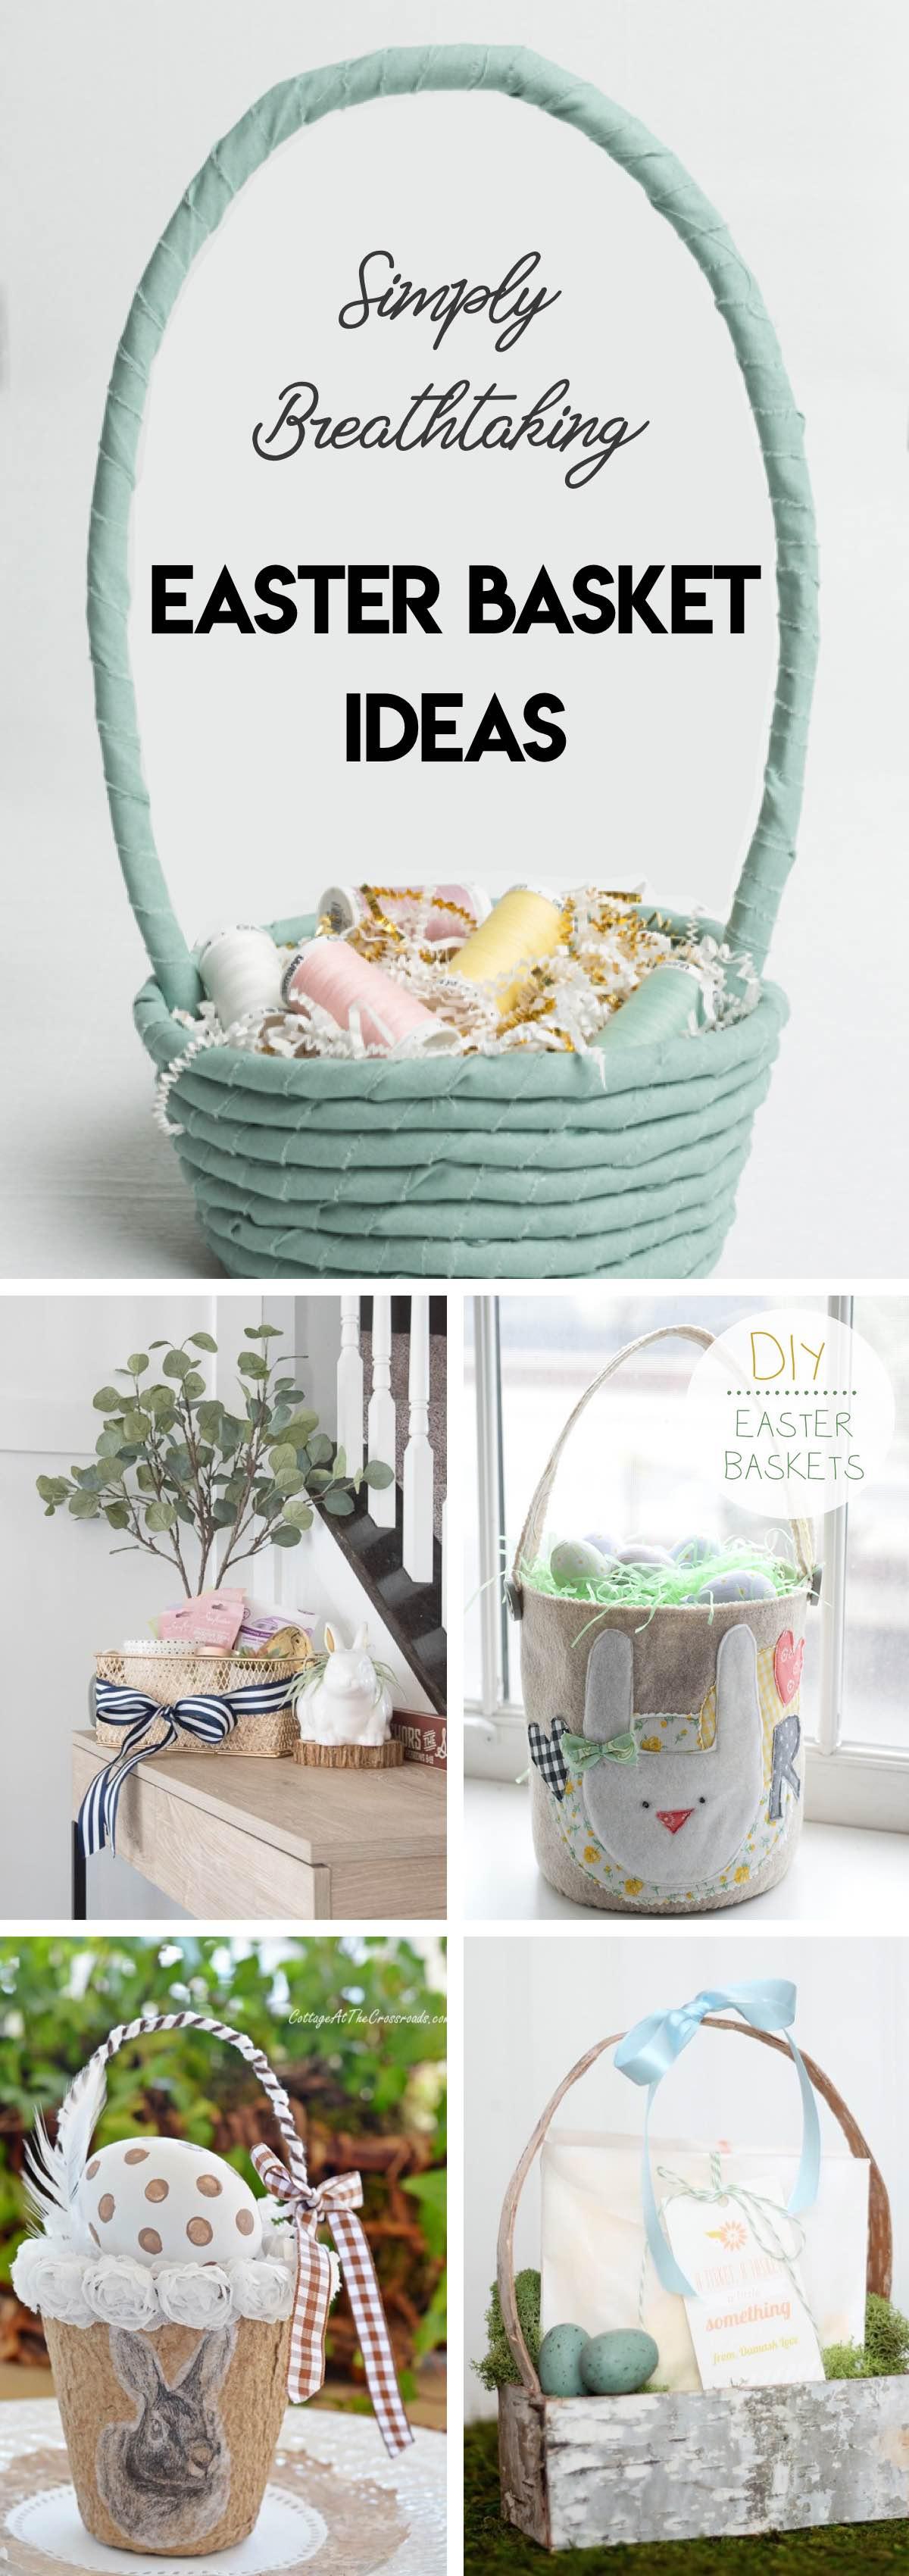 20 Simply Breathtaking Easter Basket Ideas